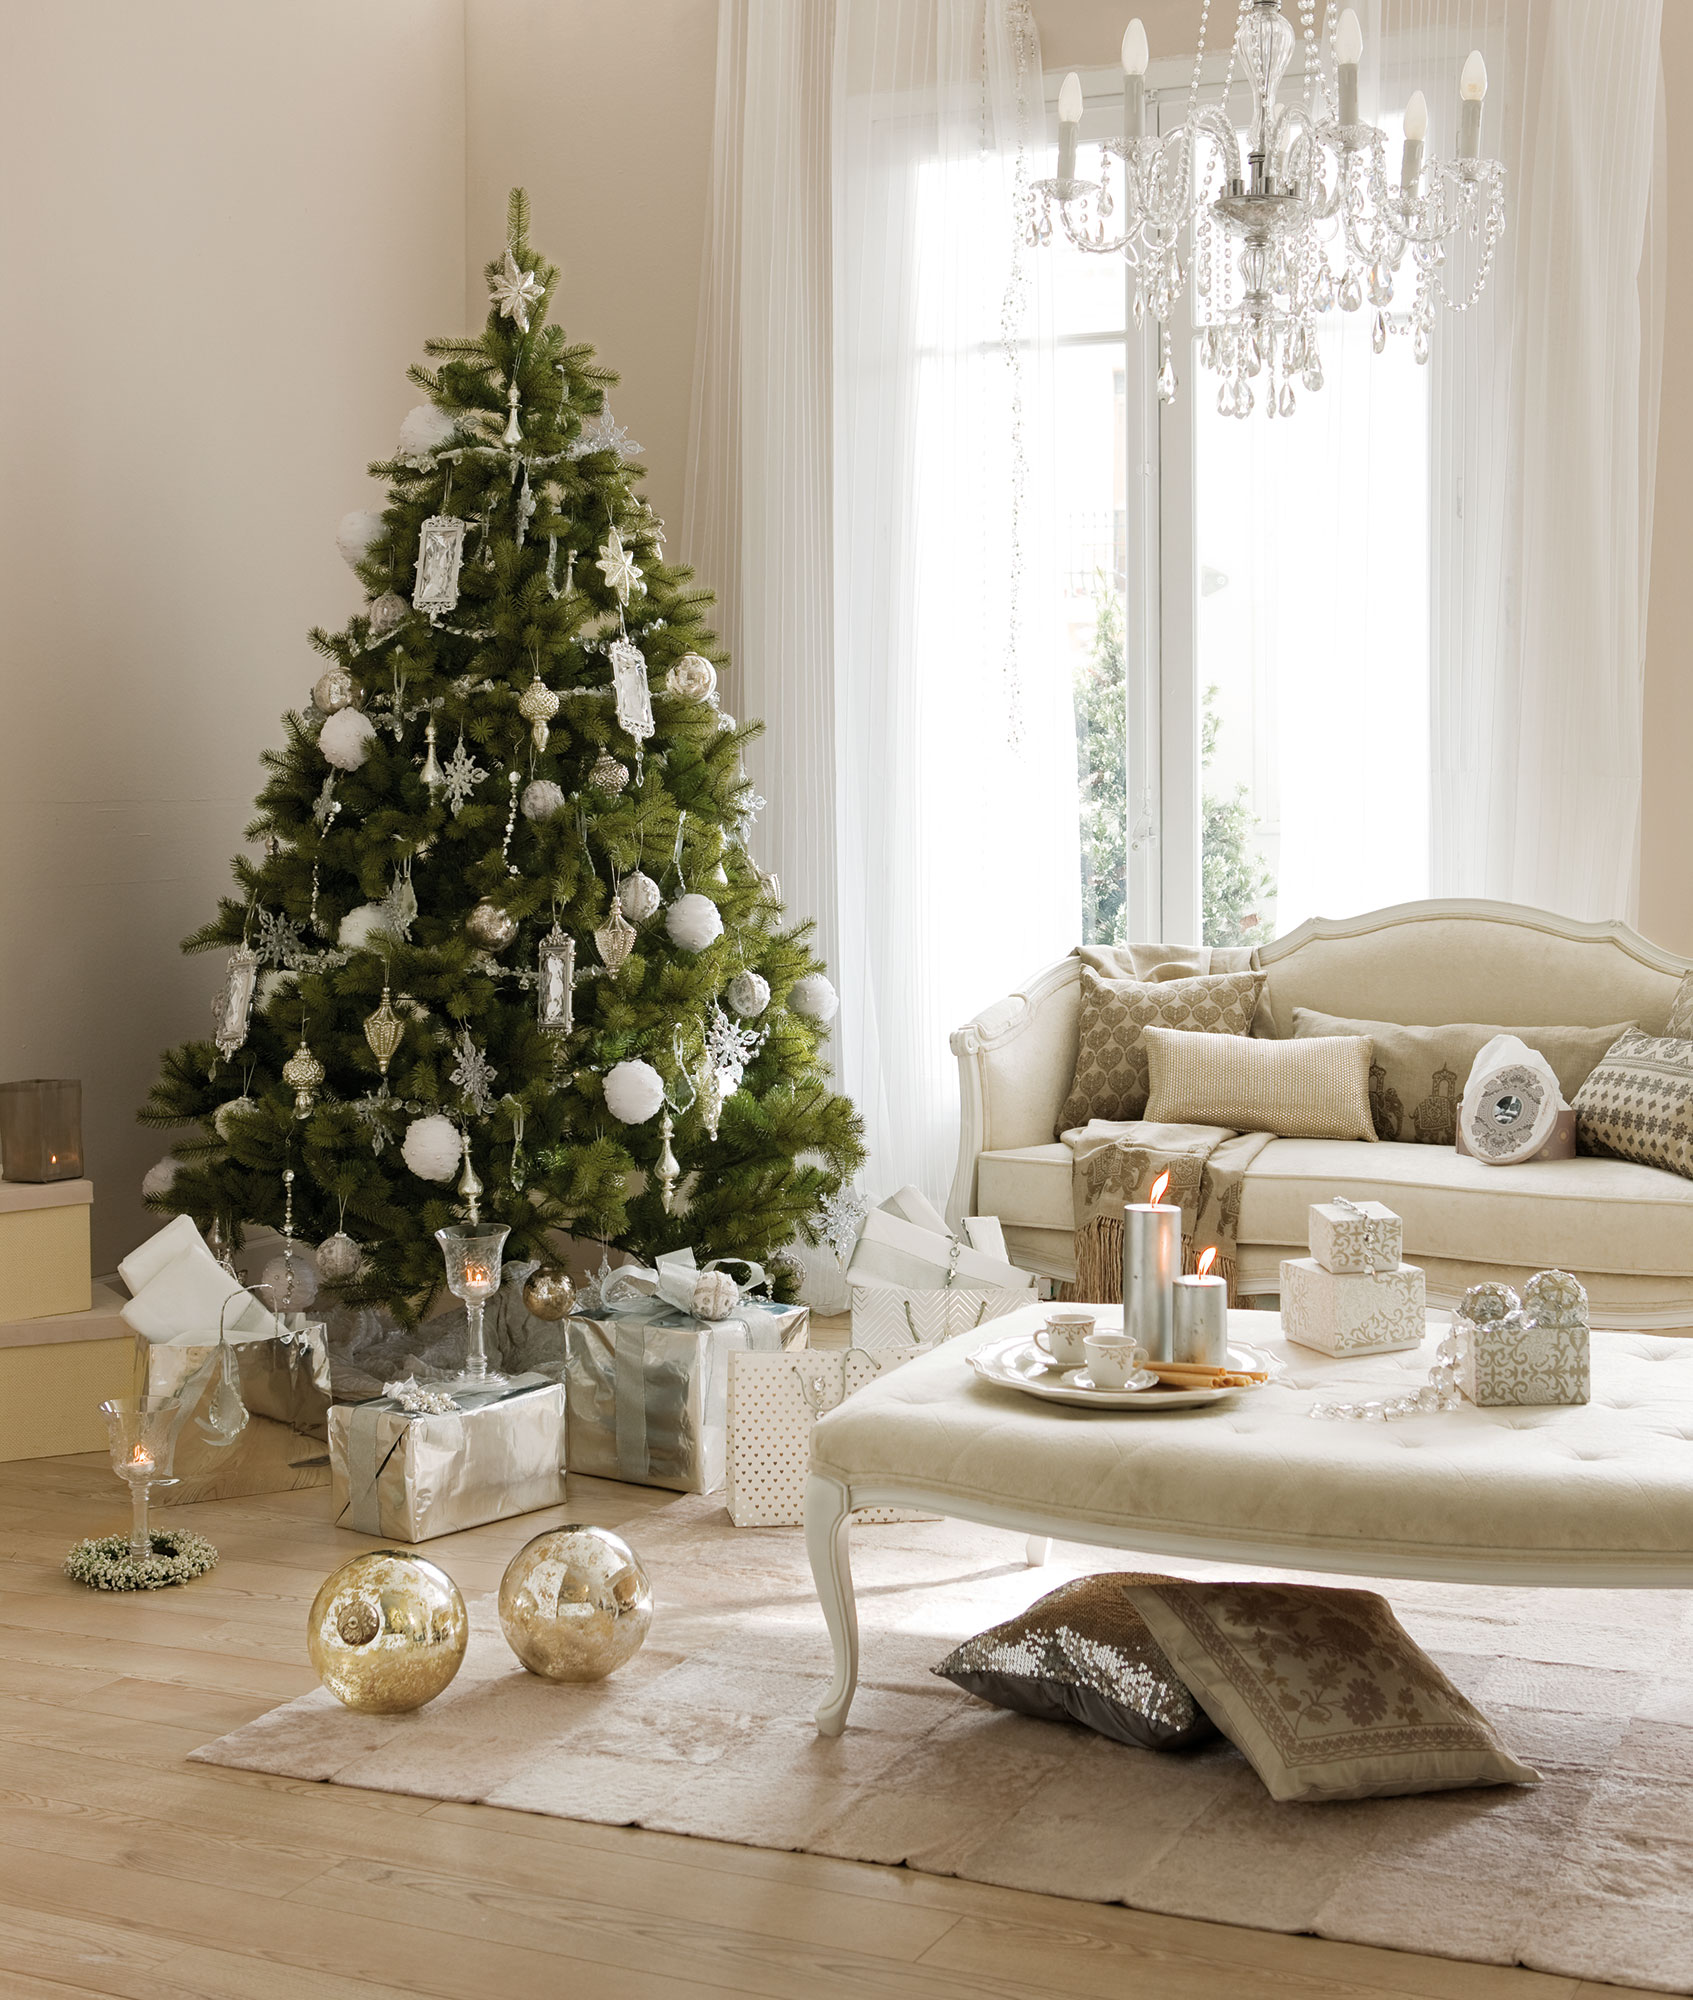 Detalles e ideas en plata para decorar tu casa esta navidad - Arbol navideno blanco decorado ...